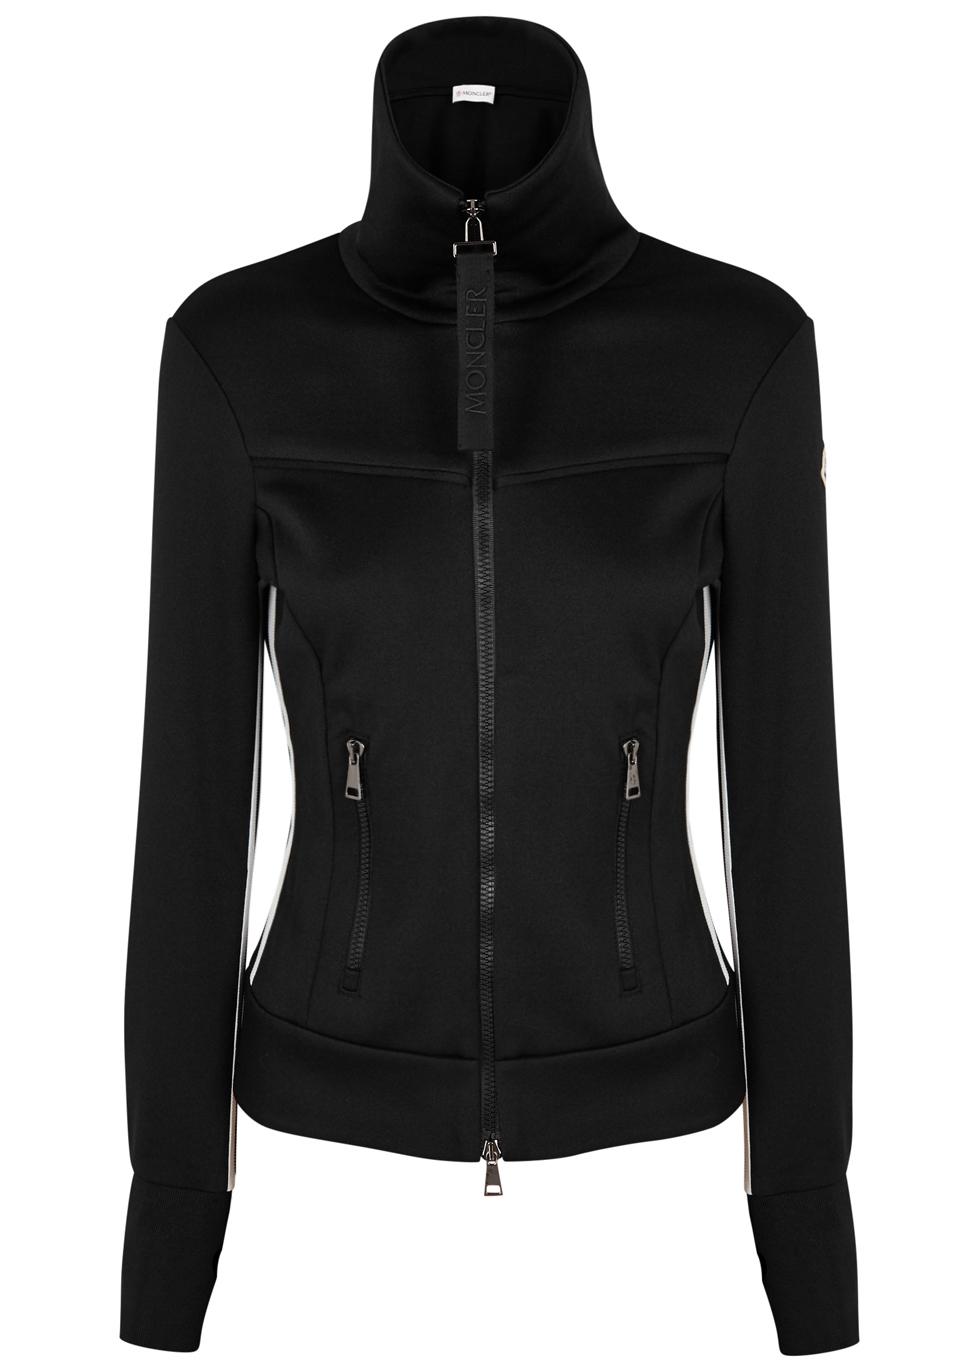 Maglia black jersey sweatshirt